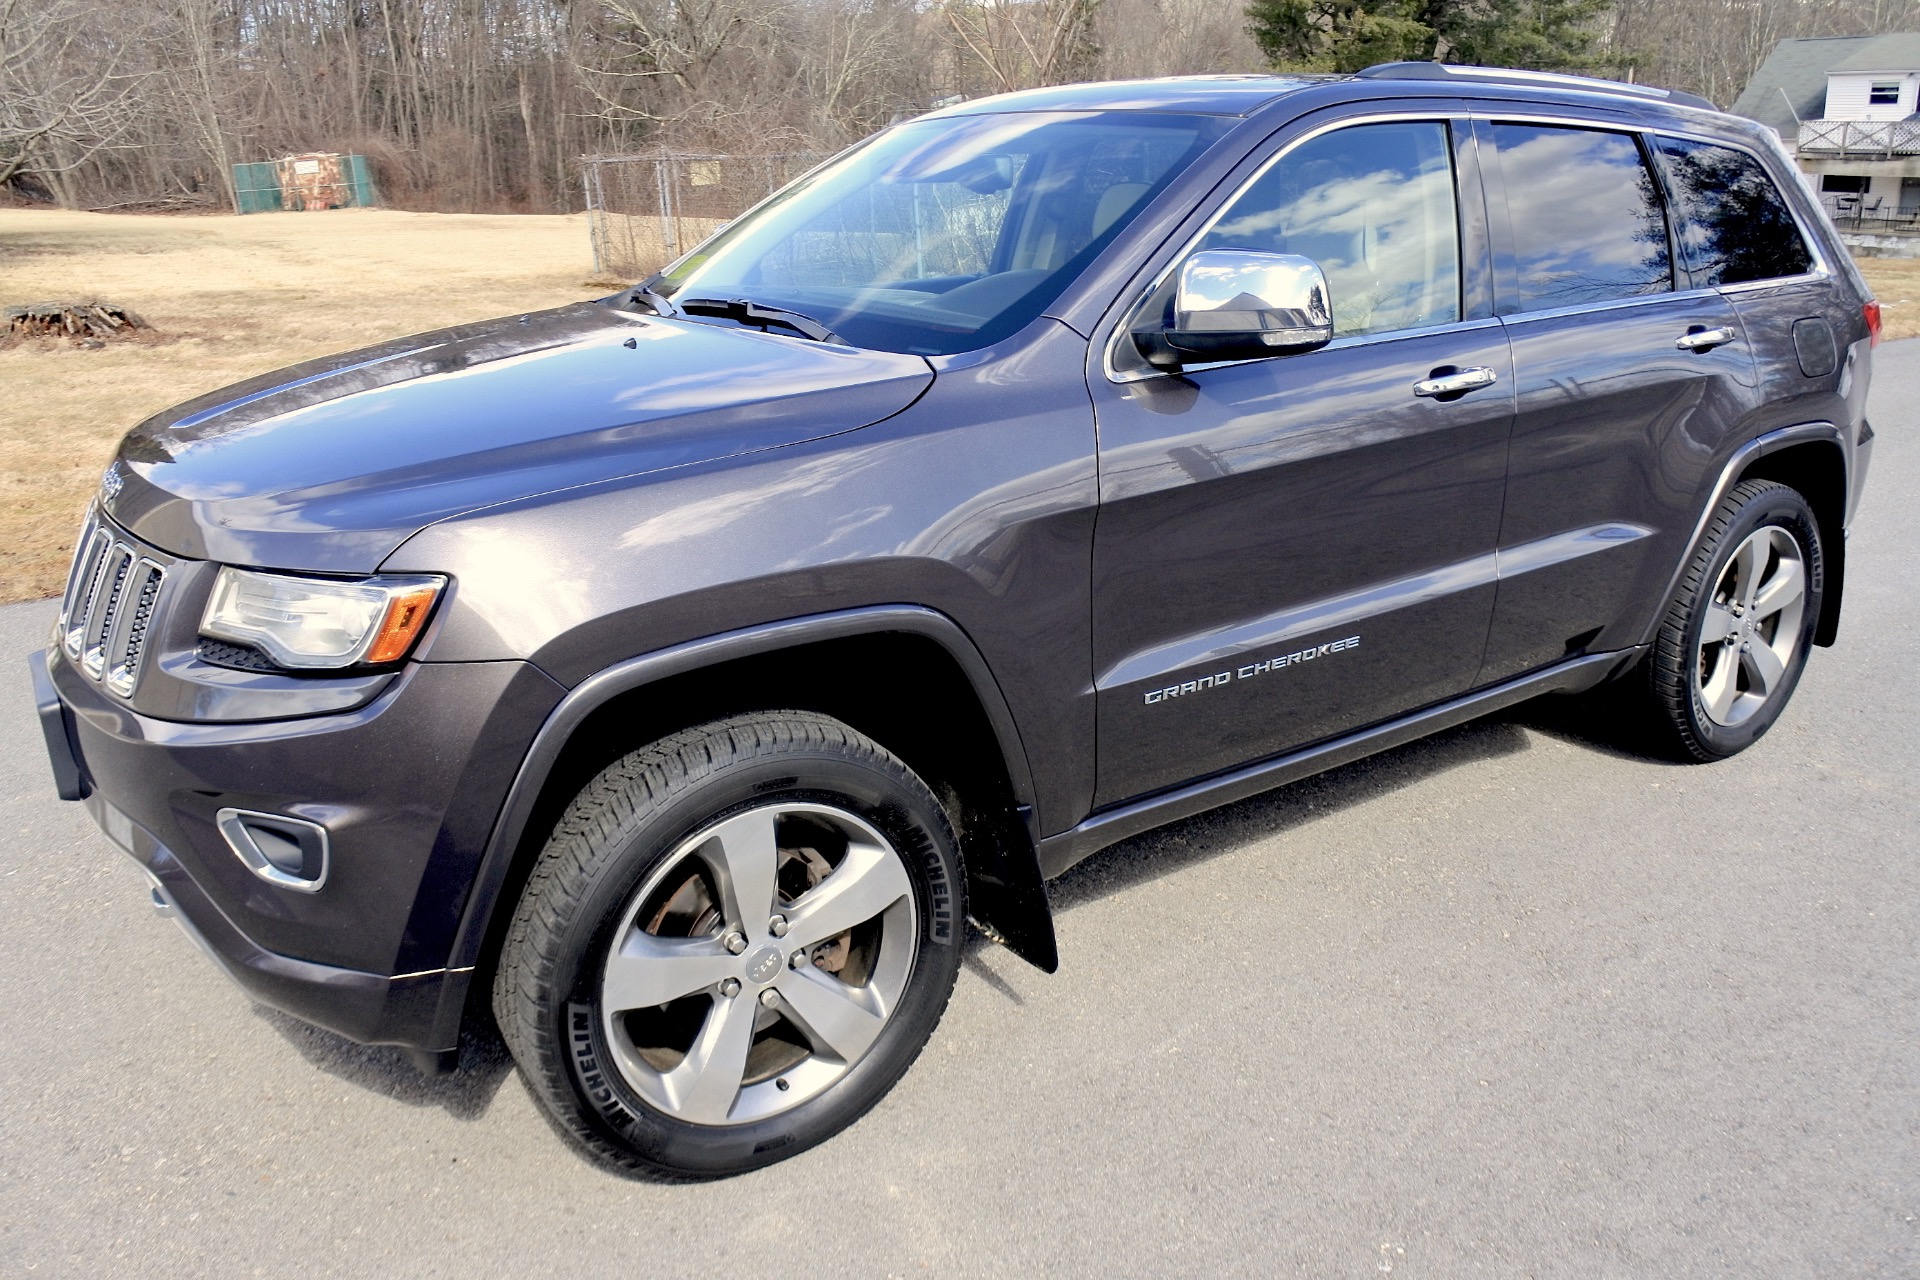 Used 2014 Jeep Grand Cherokee Overland 4WD Used 2014 Jeep Grand Cherokee Overland 4WD for sale  at Metro West Motorcars LLC in Shrewsbury MA 1